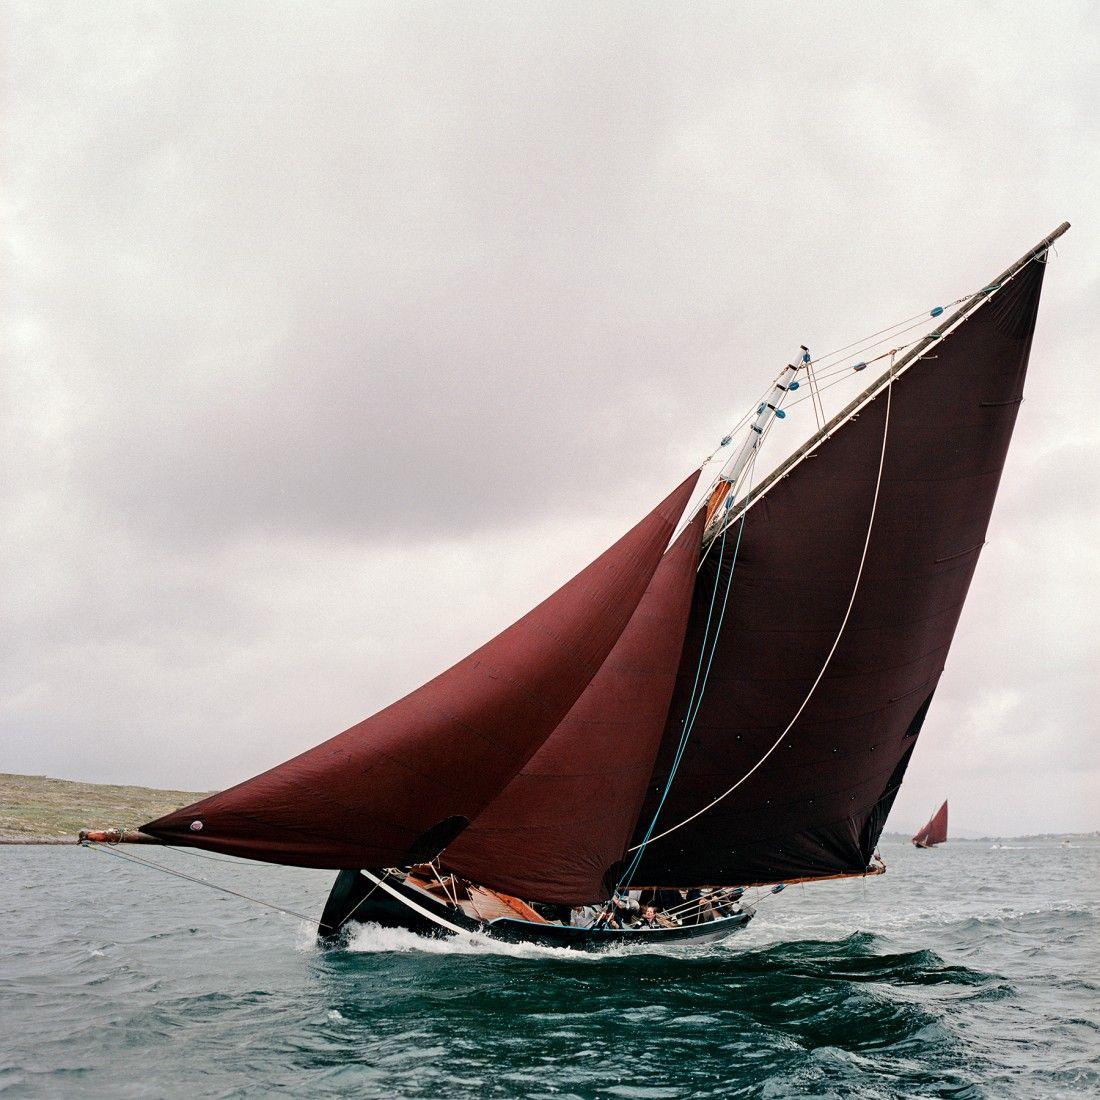 Burgendy sail - Maurice_Gunning